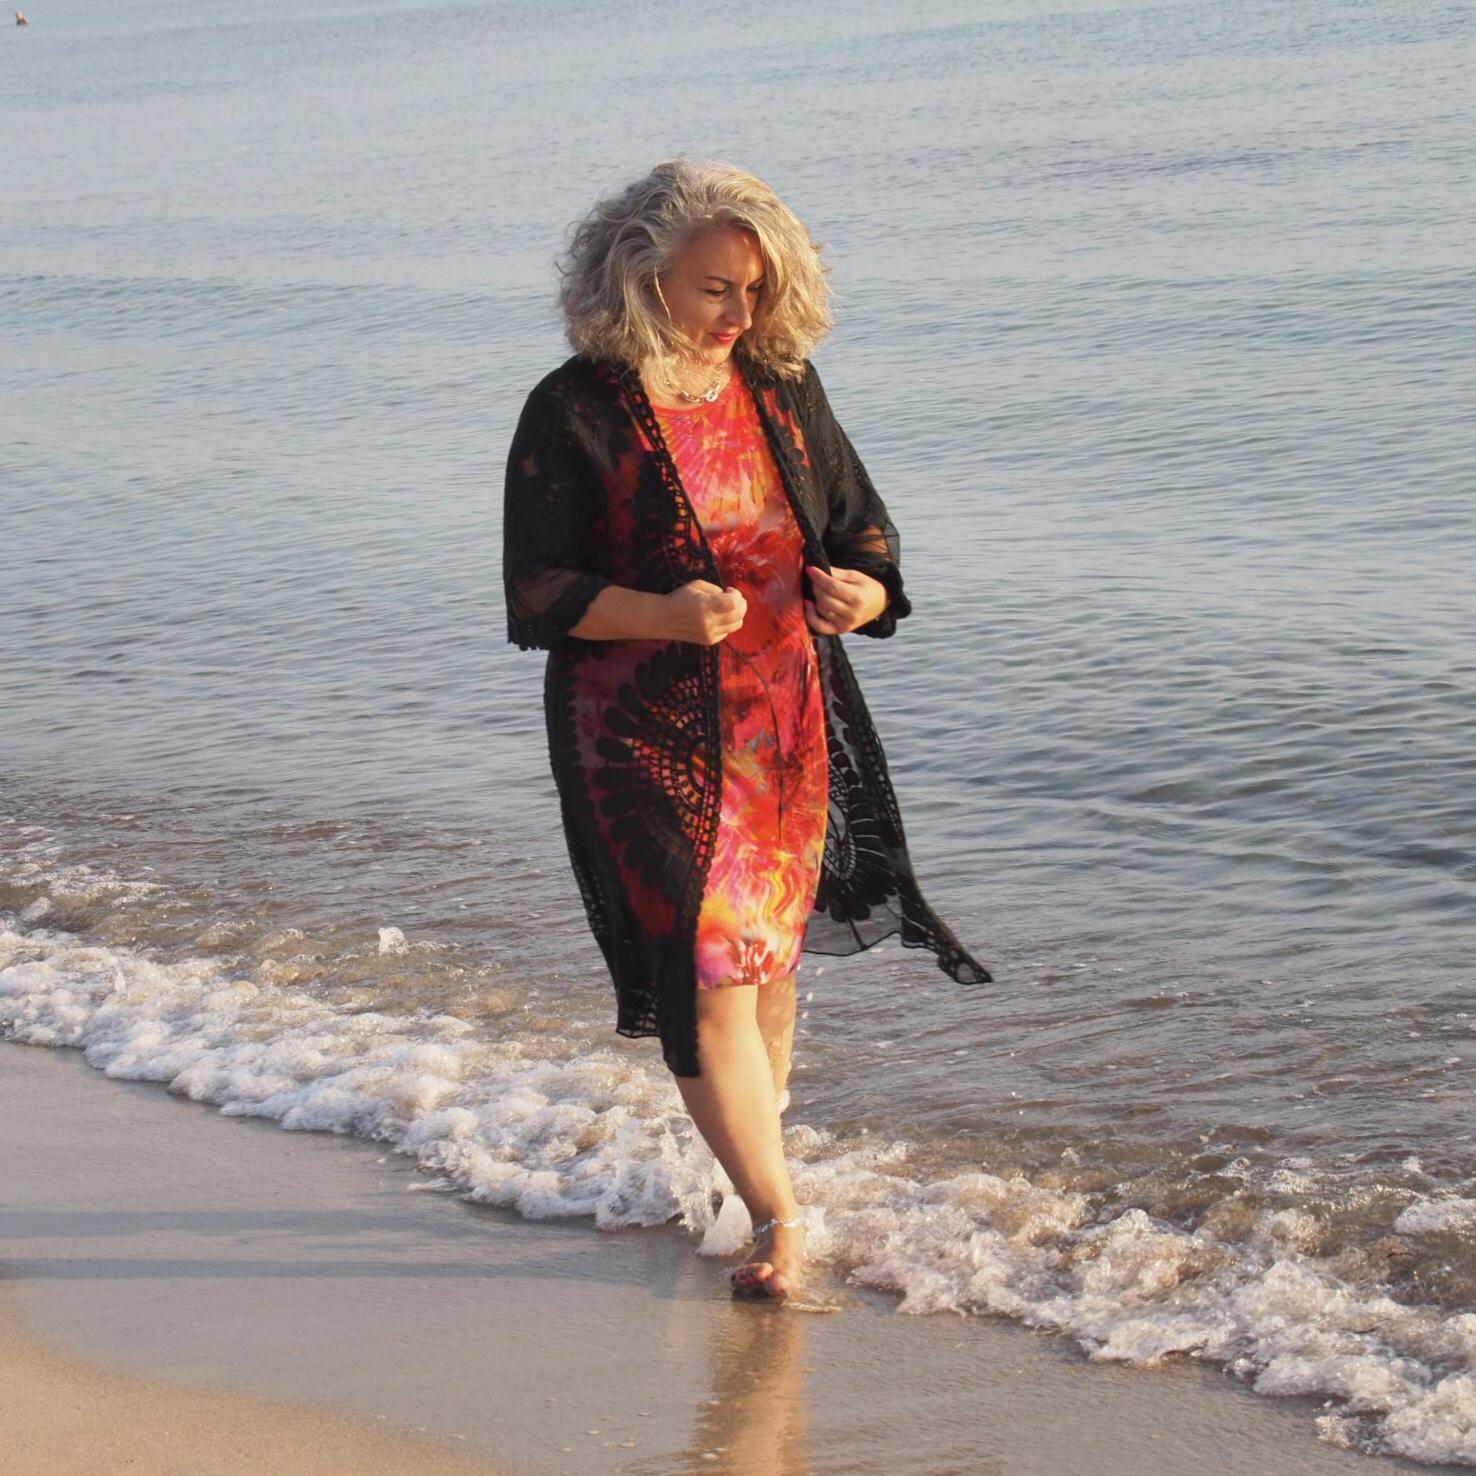 Vacances à Majorque: que faire? Où manger? Où dormir?